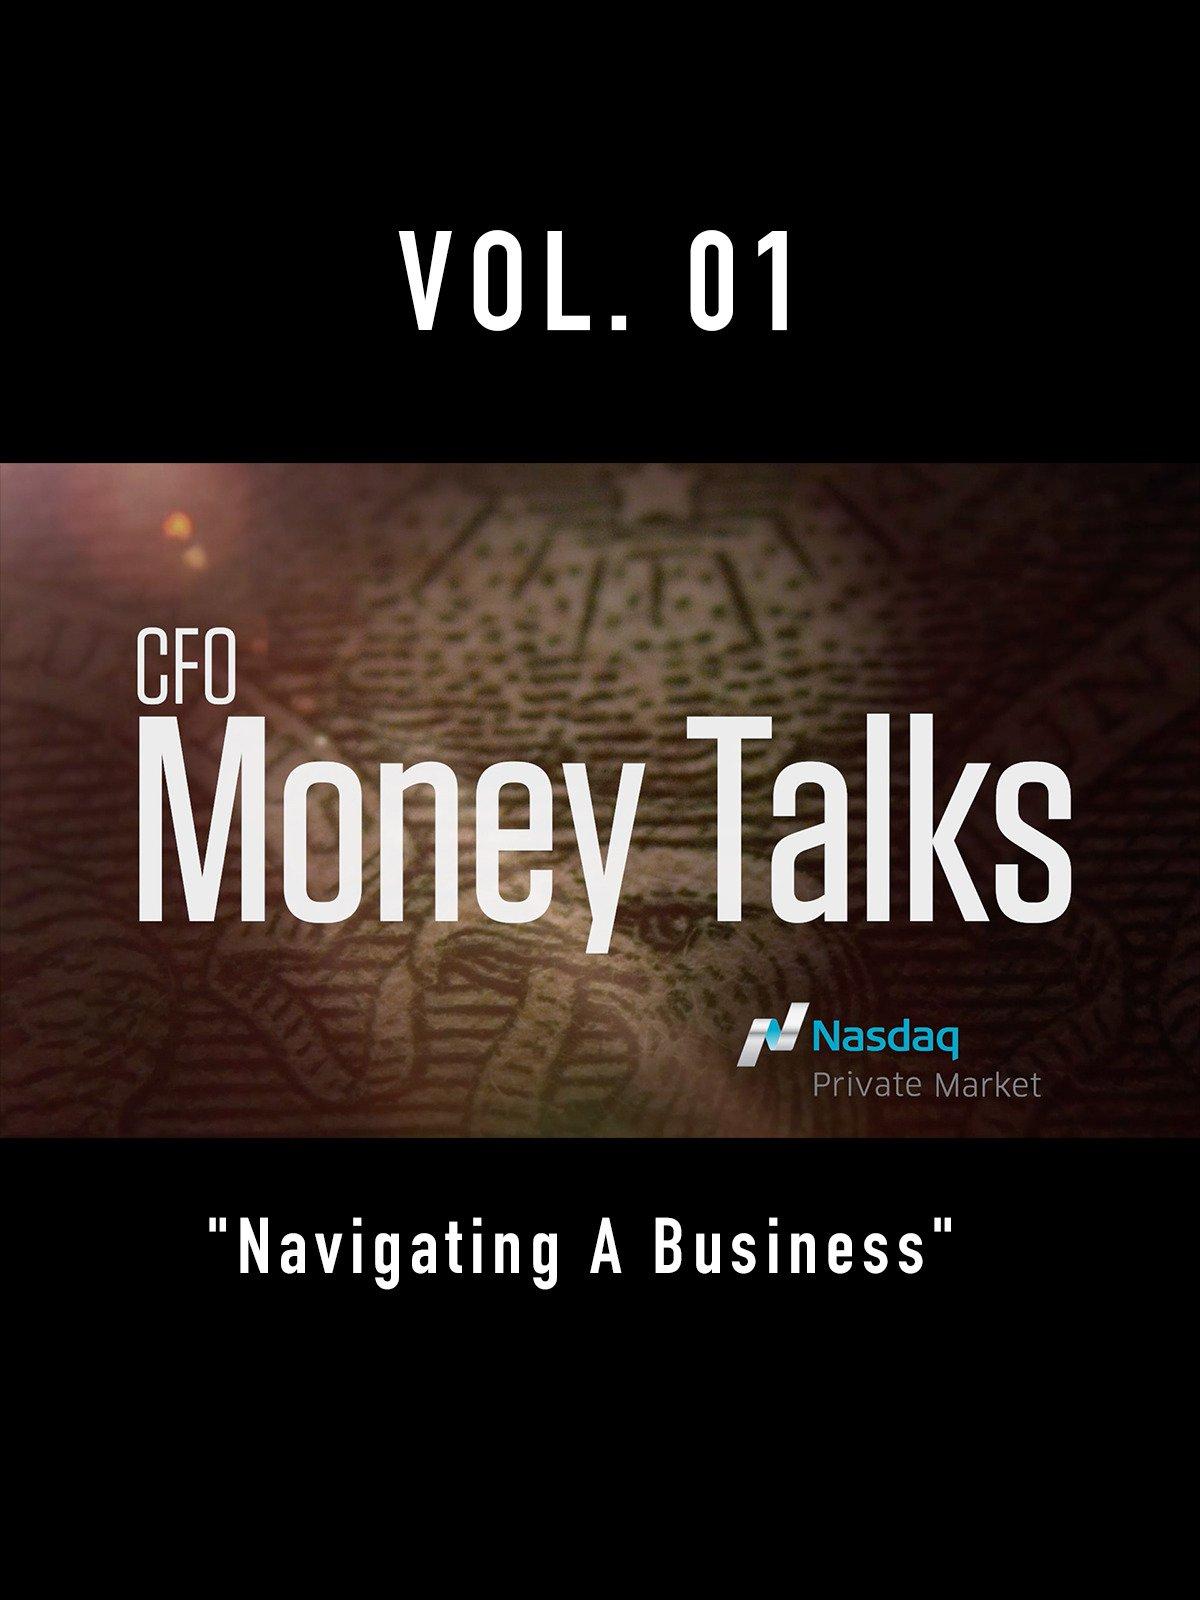 CFO Money Talks Vol. 01